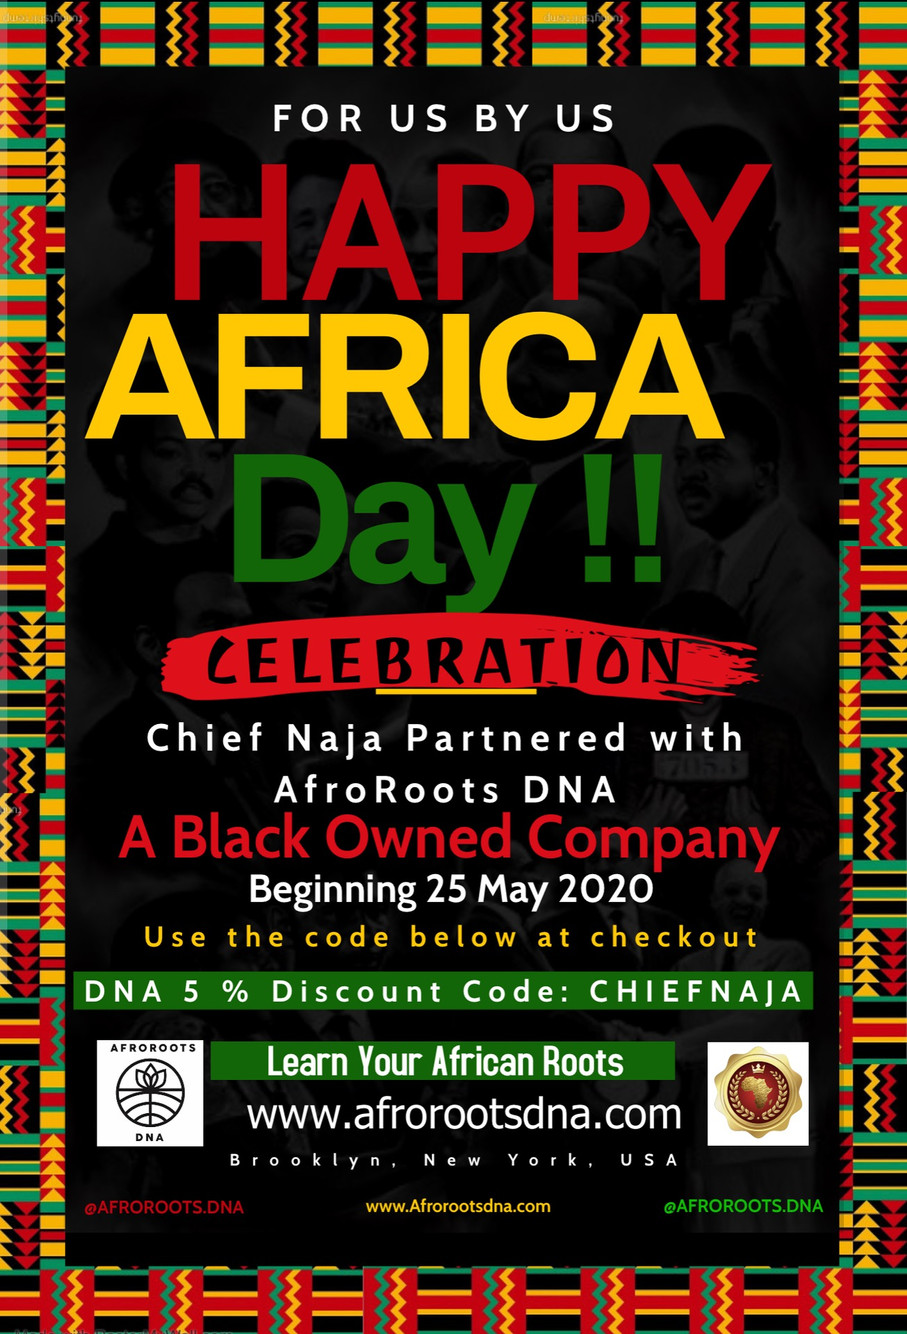 AfroRoots DNA Discount